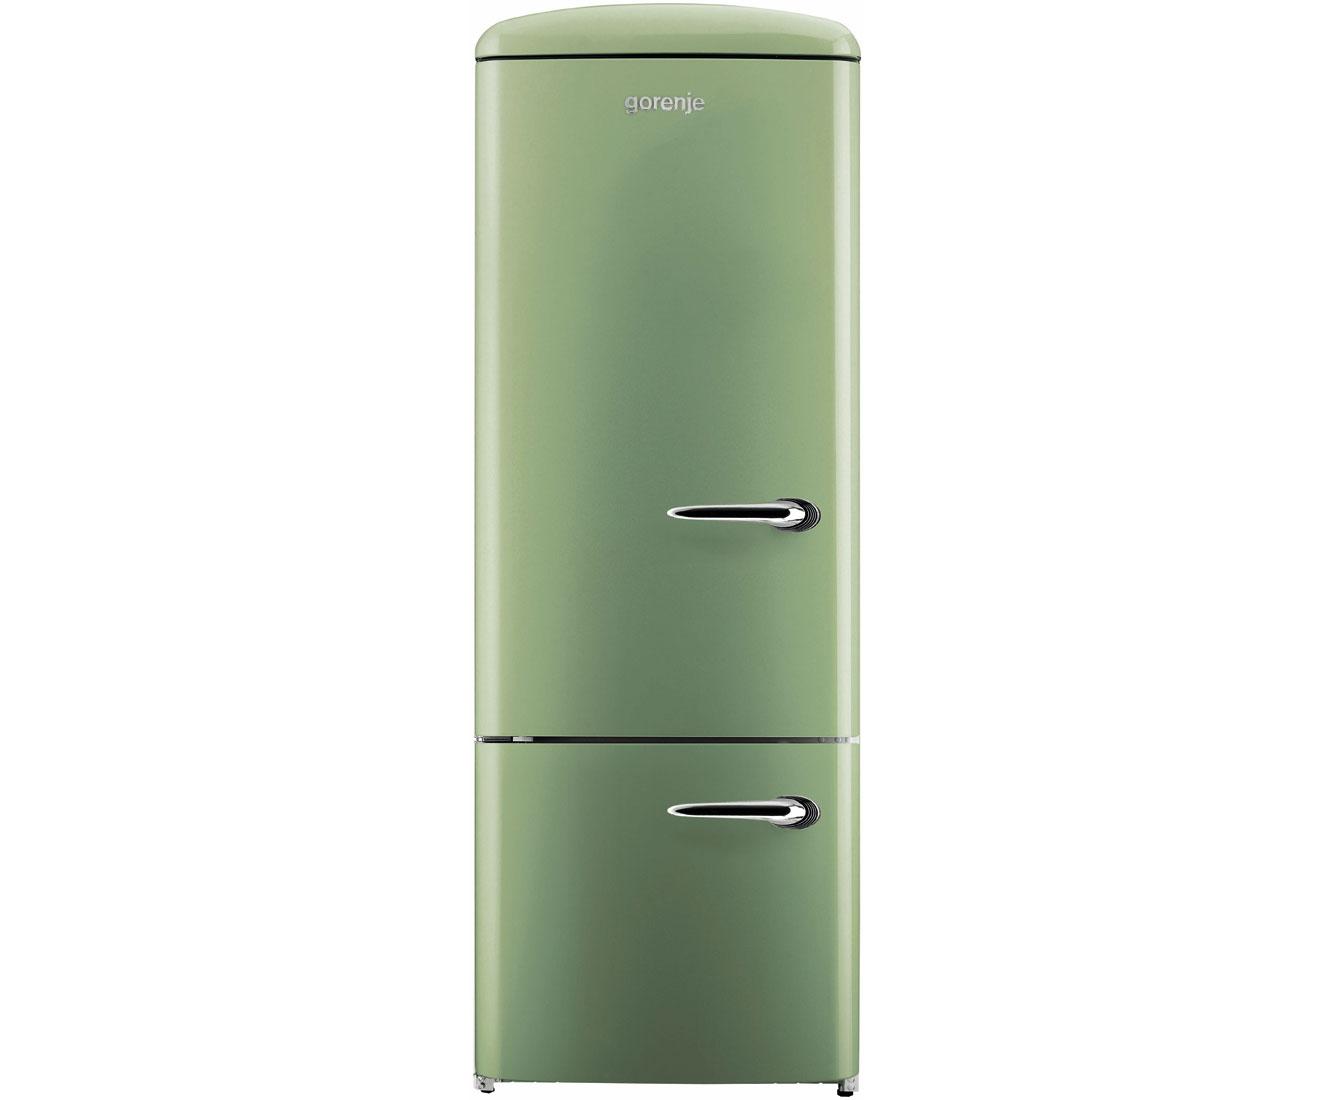 Gorenje Kühlschrank Kombi : Gorenje kühl kombi retro: gorenje kuehlschrank retro schnellcheck